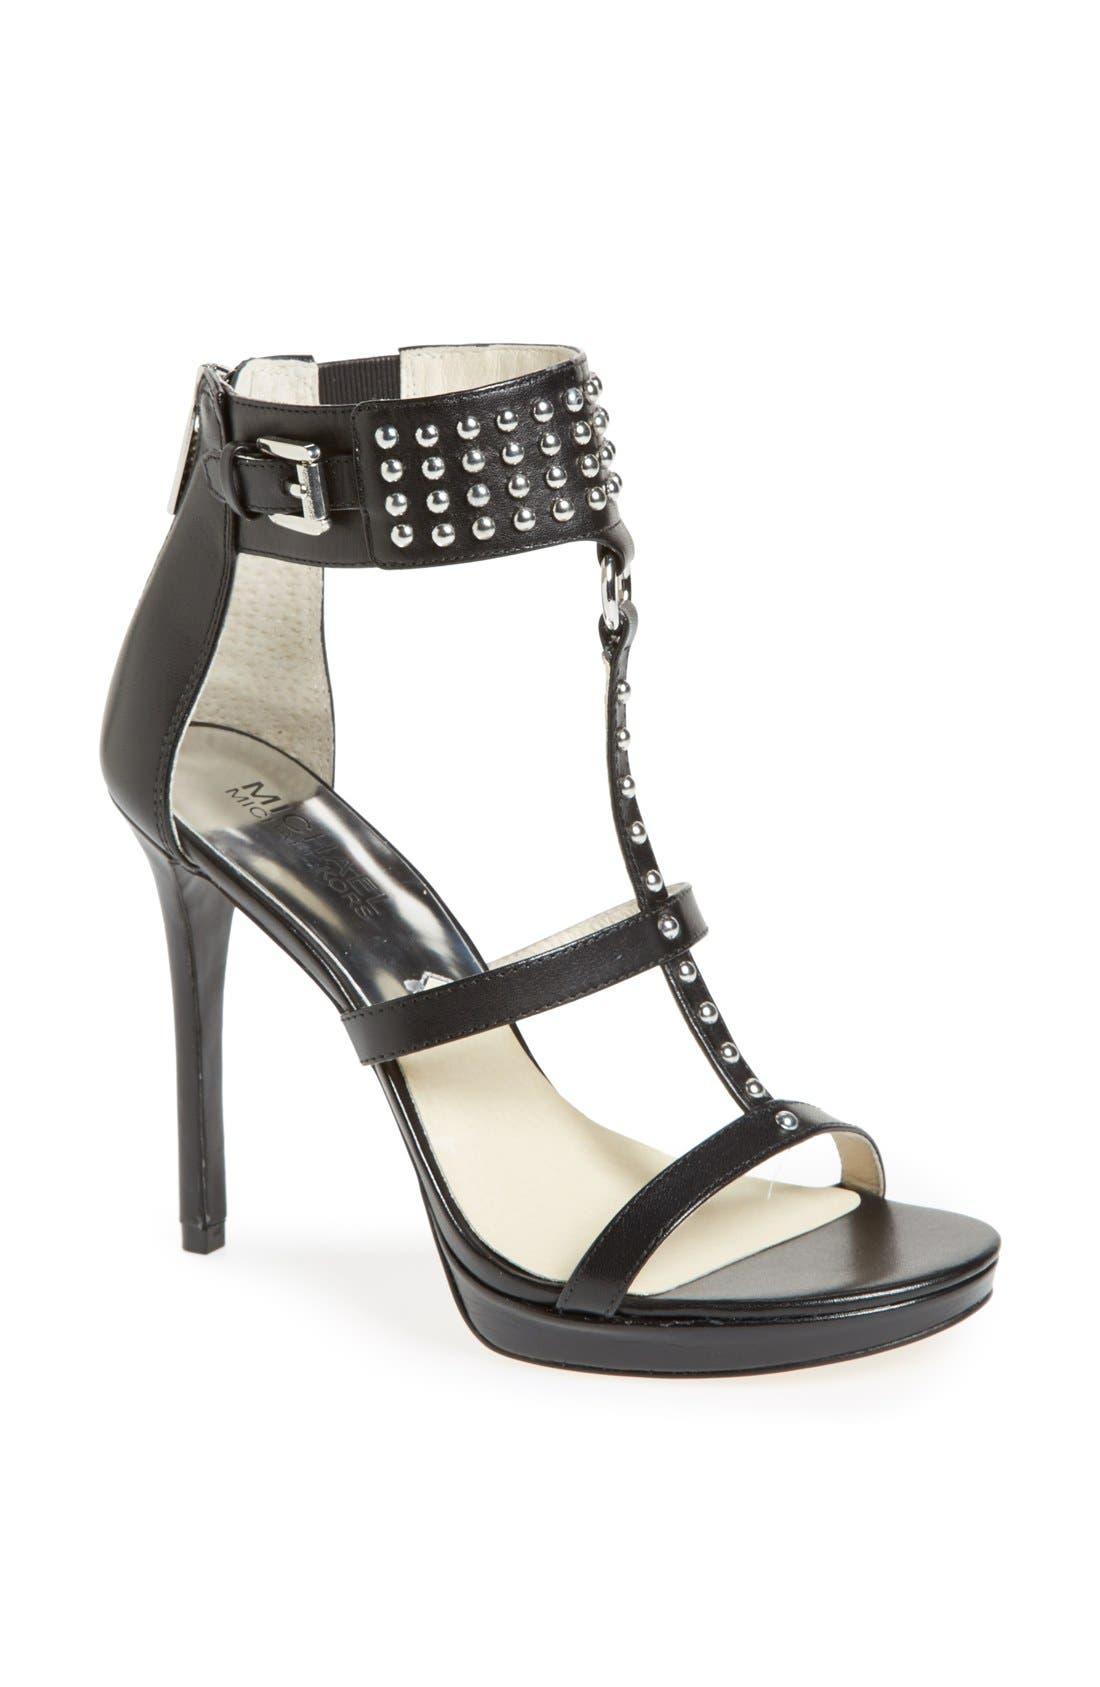 Alternate Image 1 Selected - MICHAEL Michael Kors 'Celena' Studded Leather Sandal